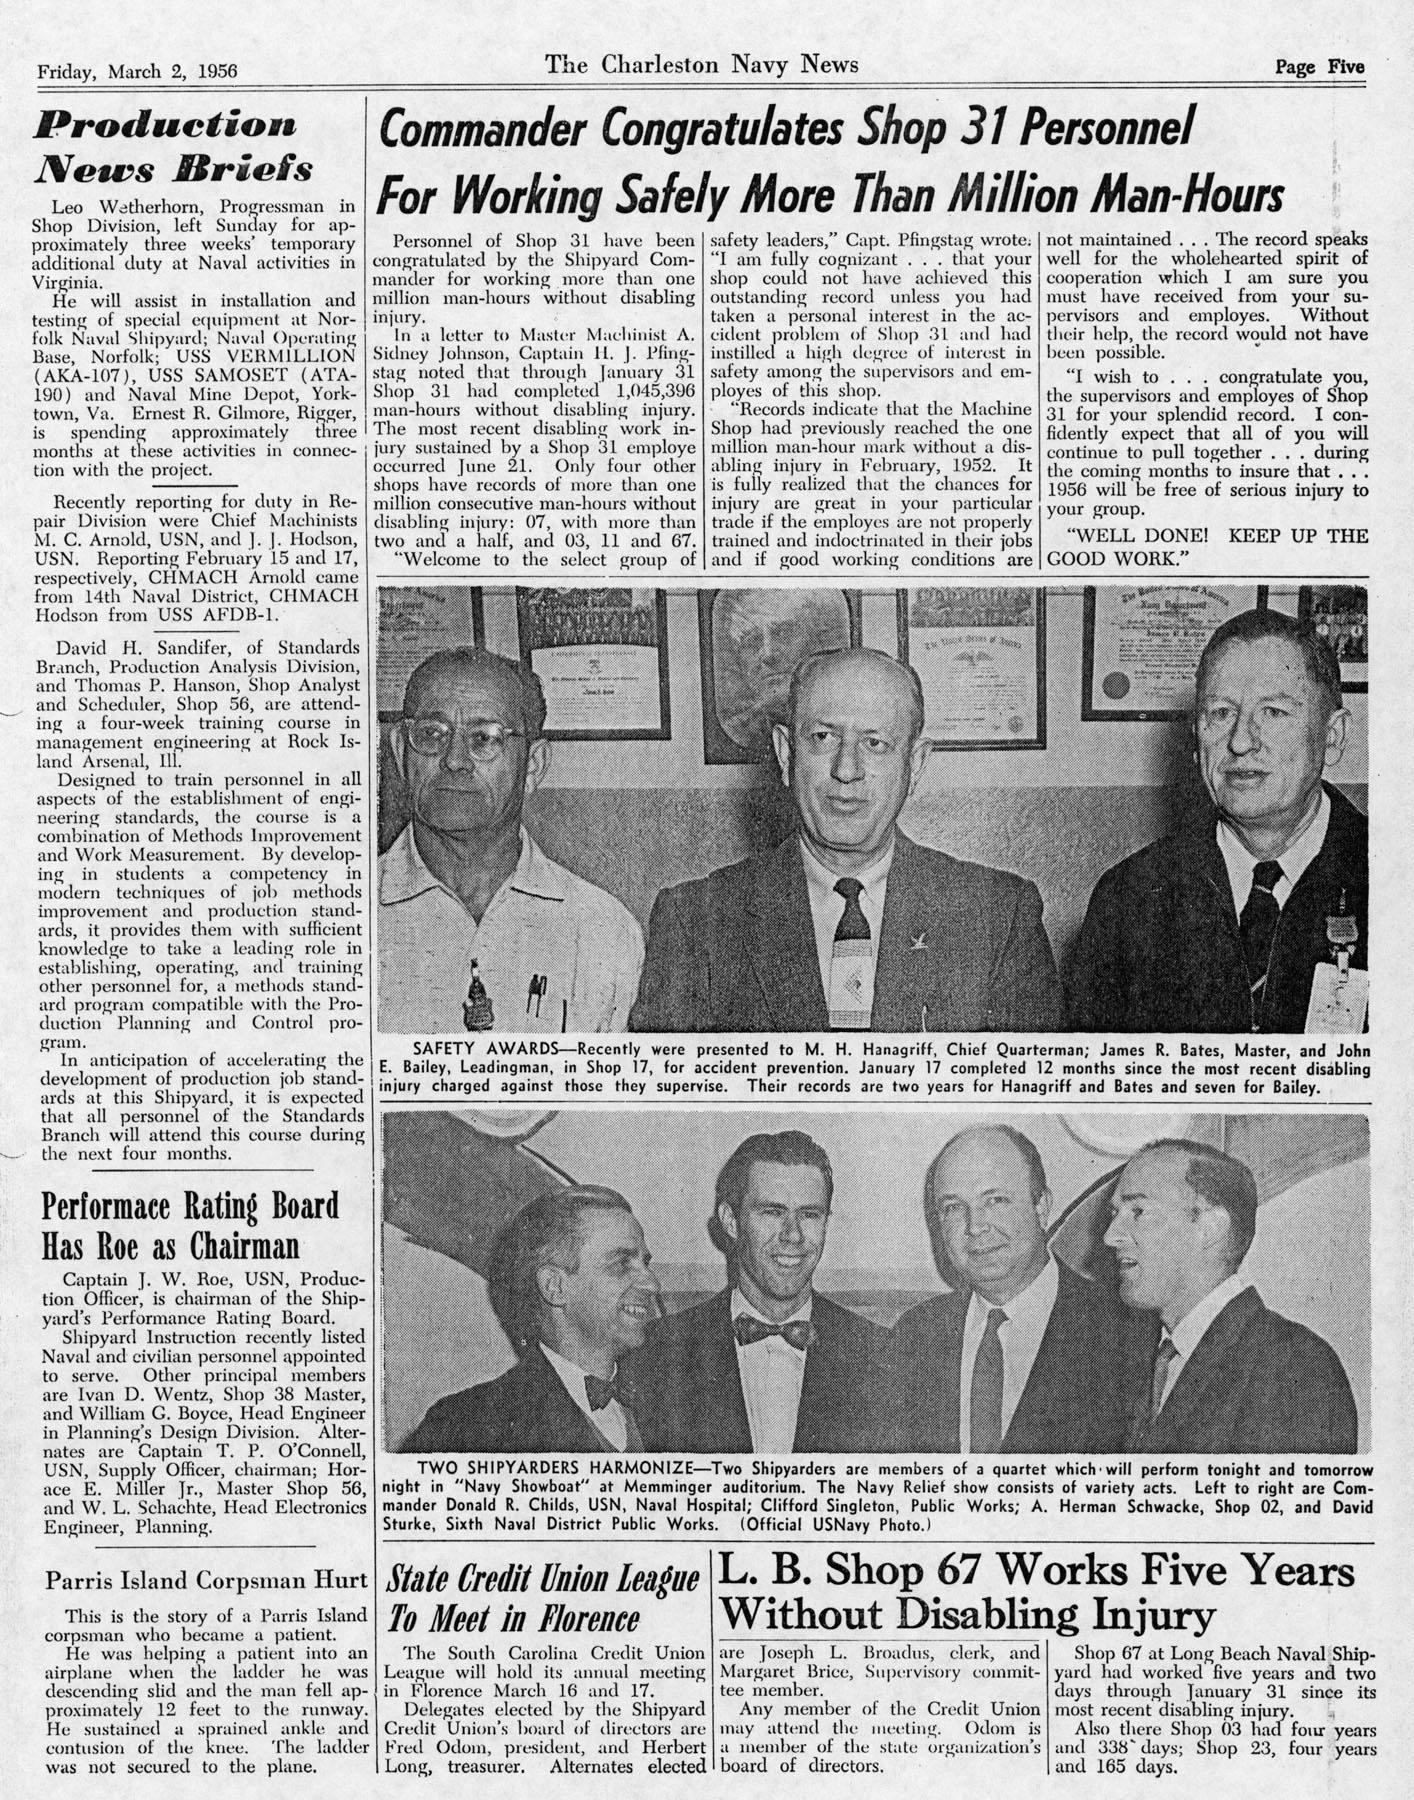 The Charleston Navy News, Volume 14, Edition 16, page v